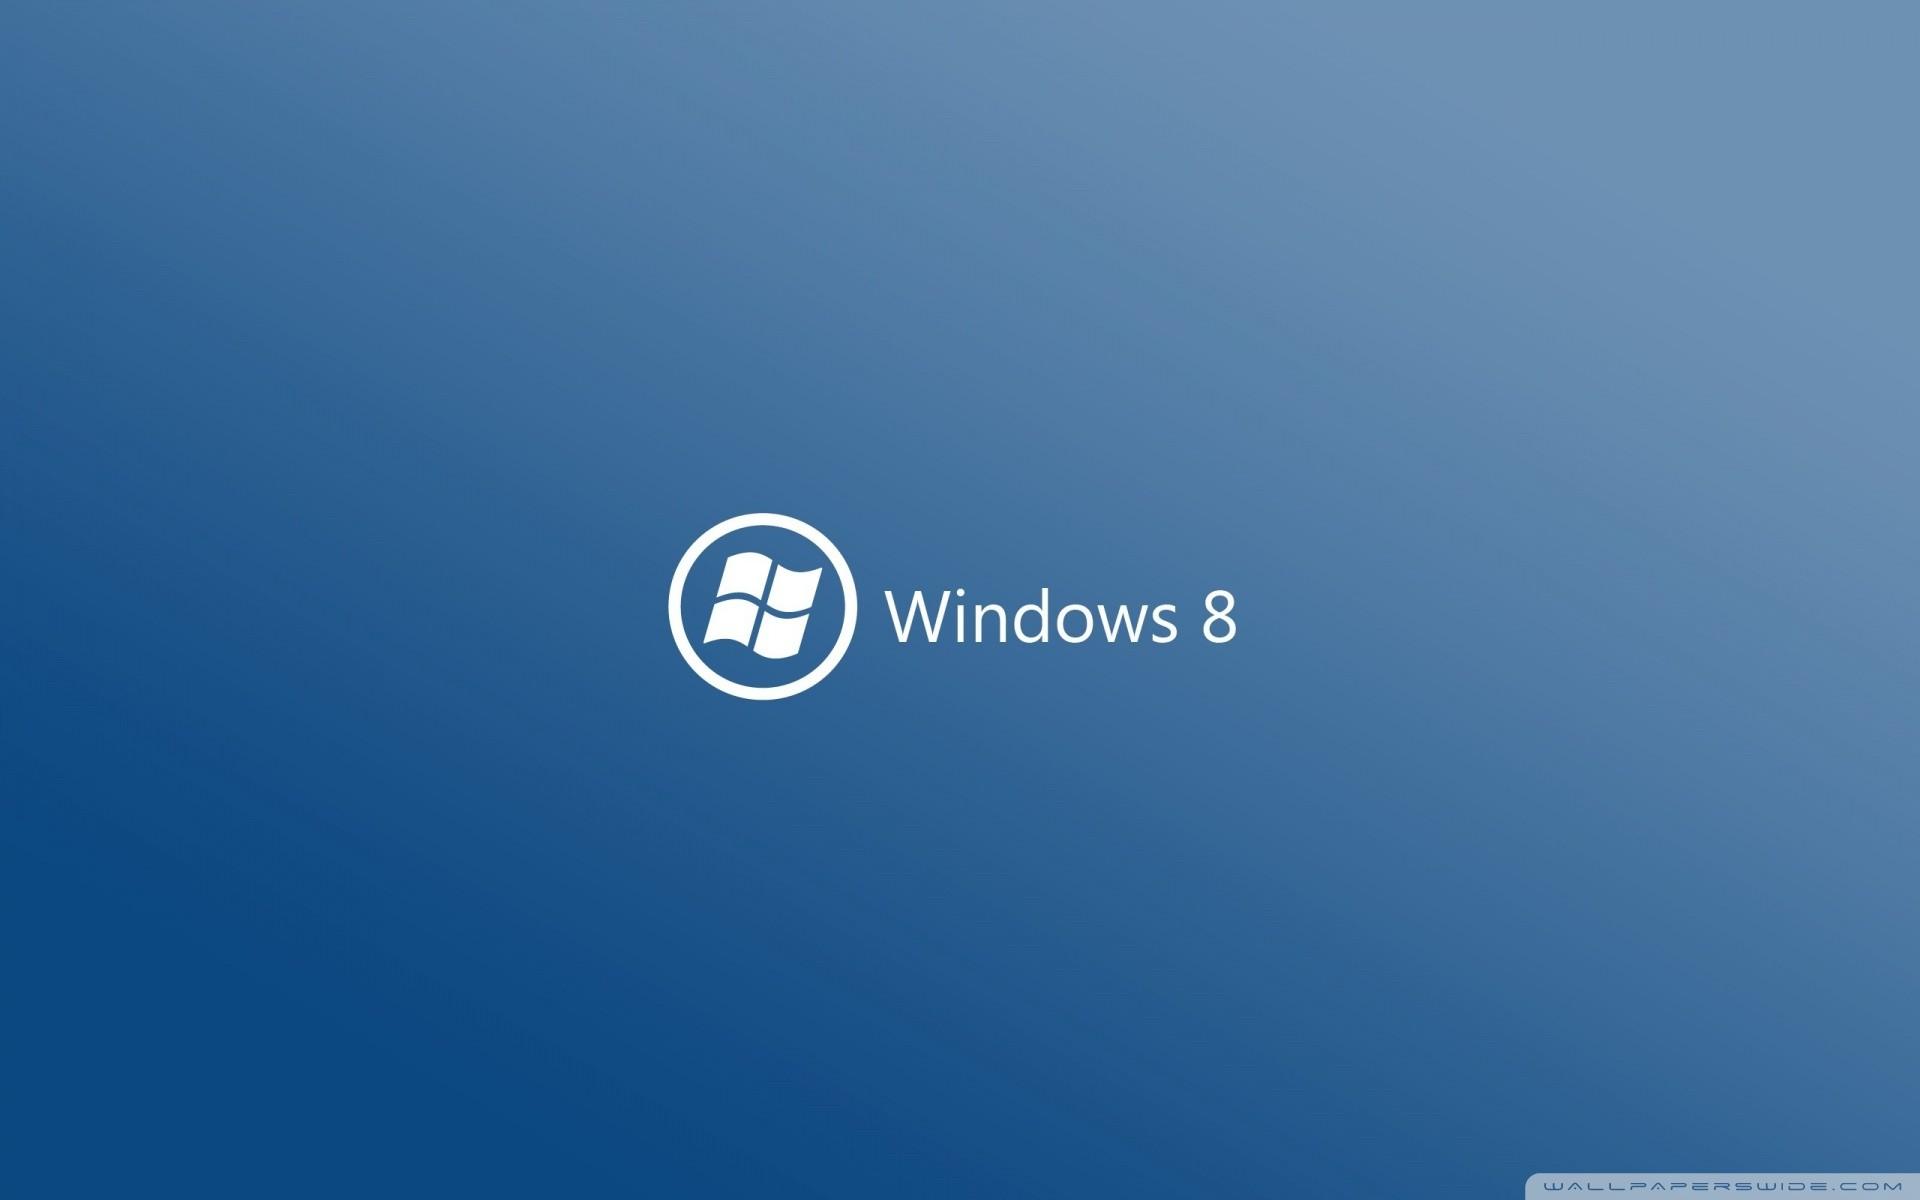 Windows 8 On Blue Background HD desktop wallpaper : High .